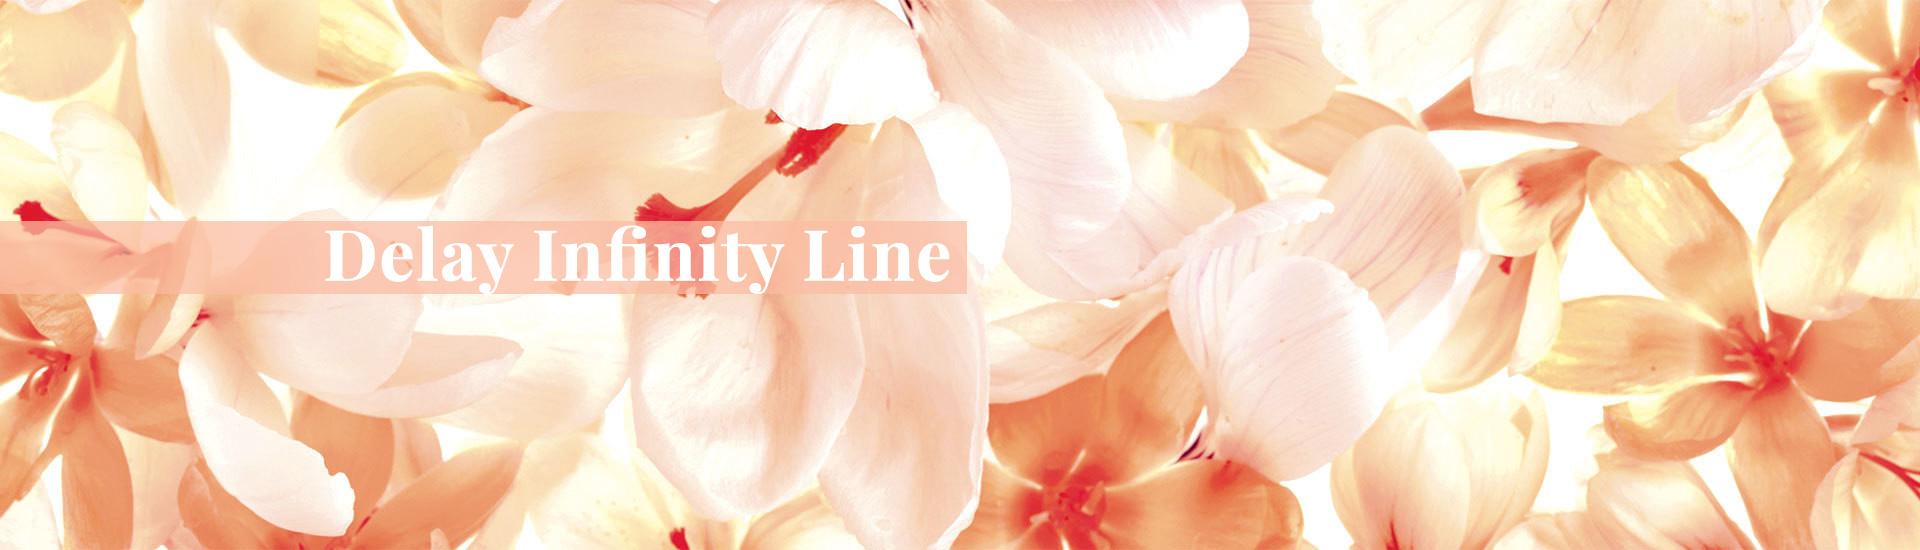 Vaggehi Delay Infinity line